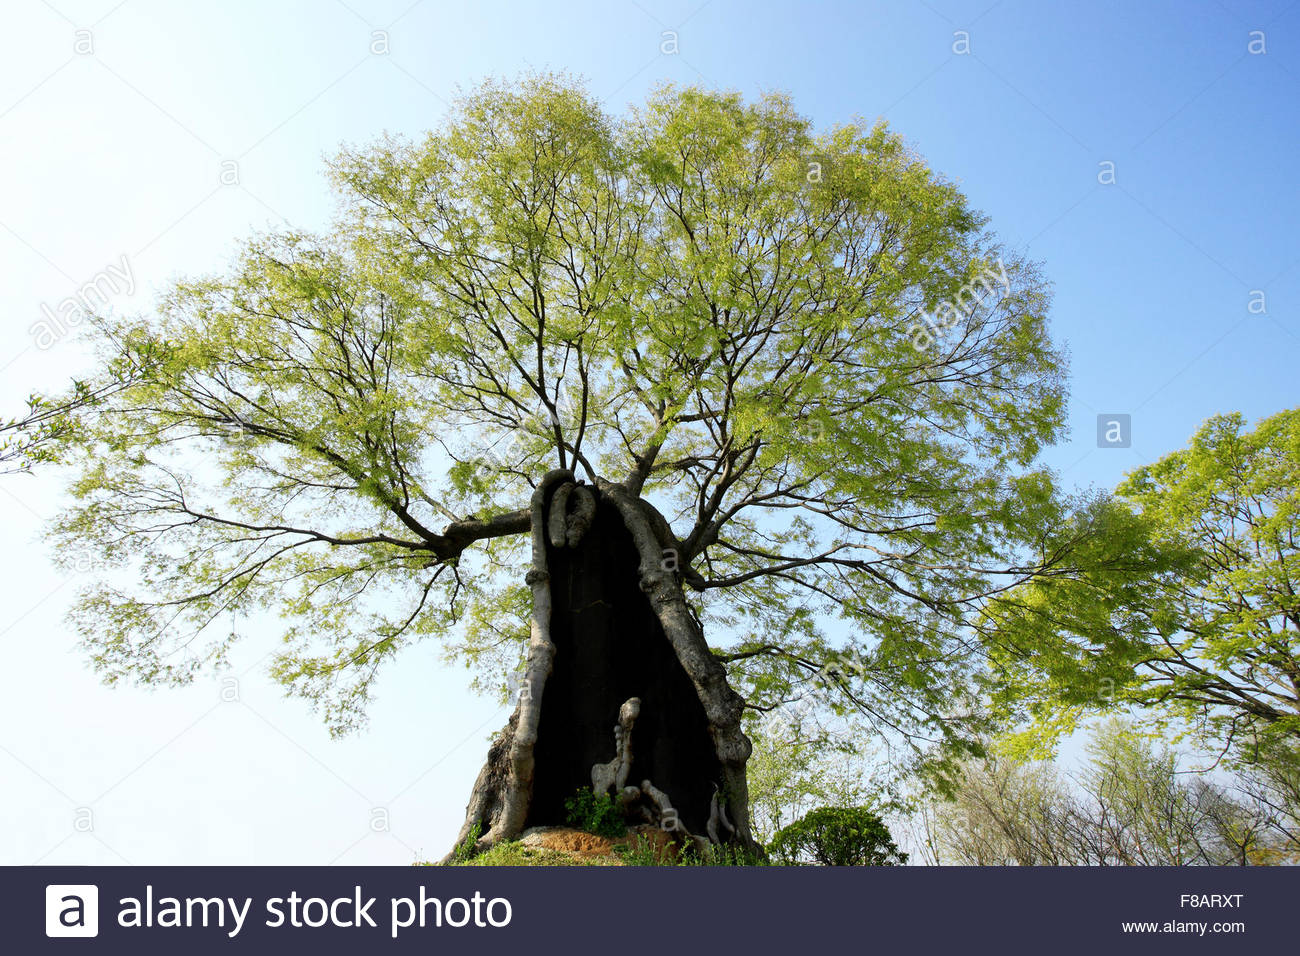 a giant zelkova tree - Stock Image